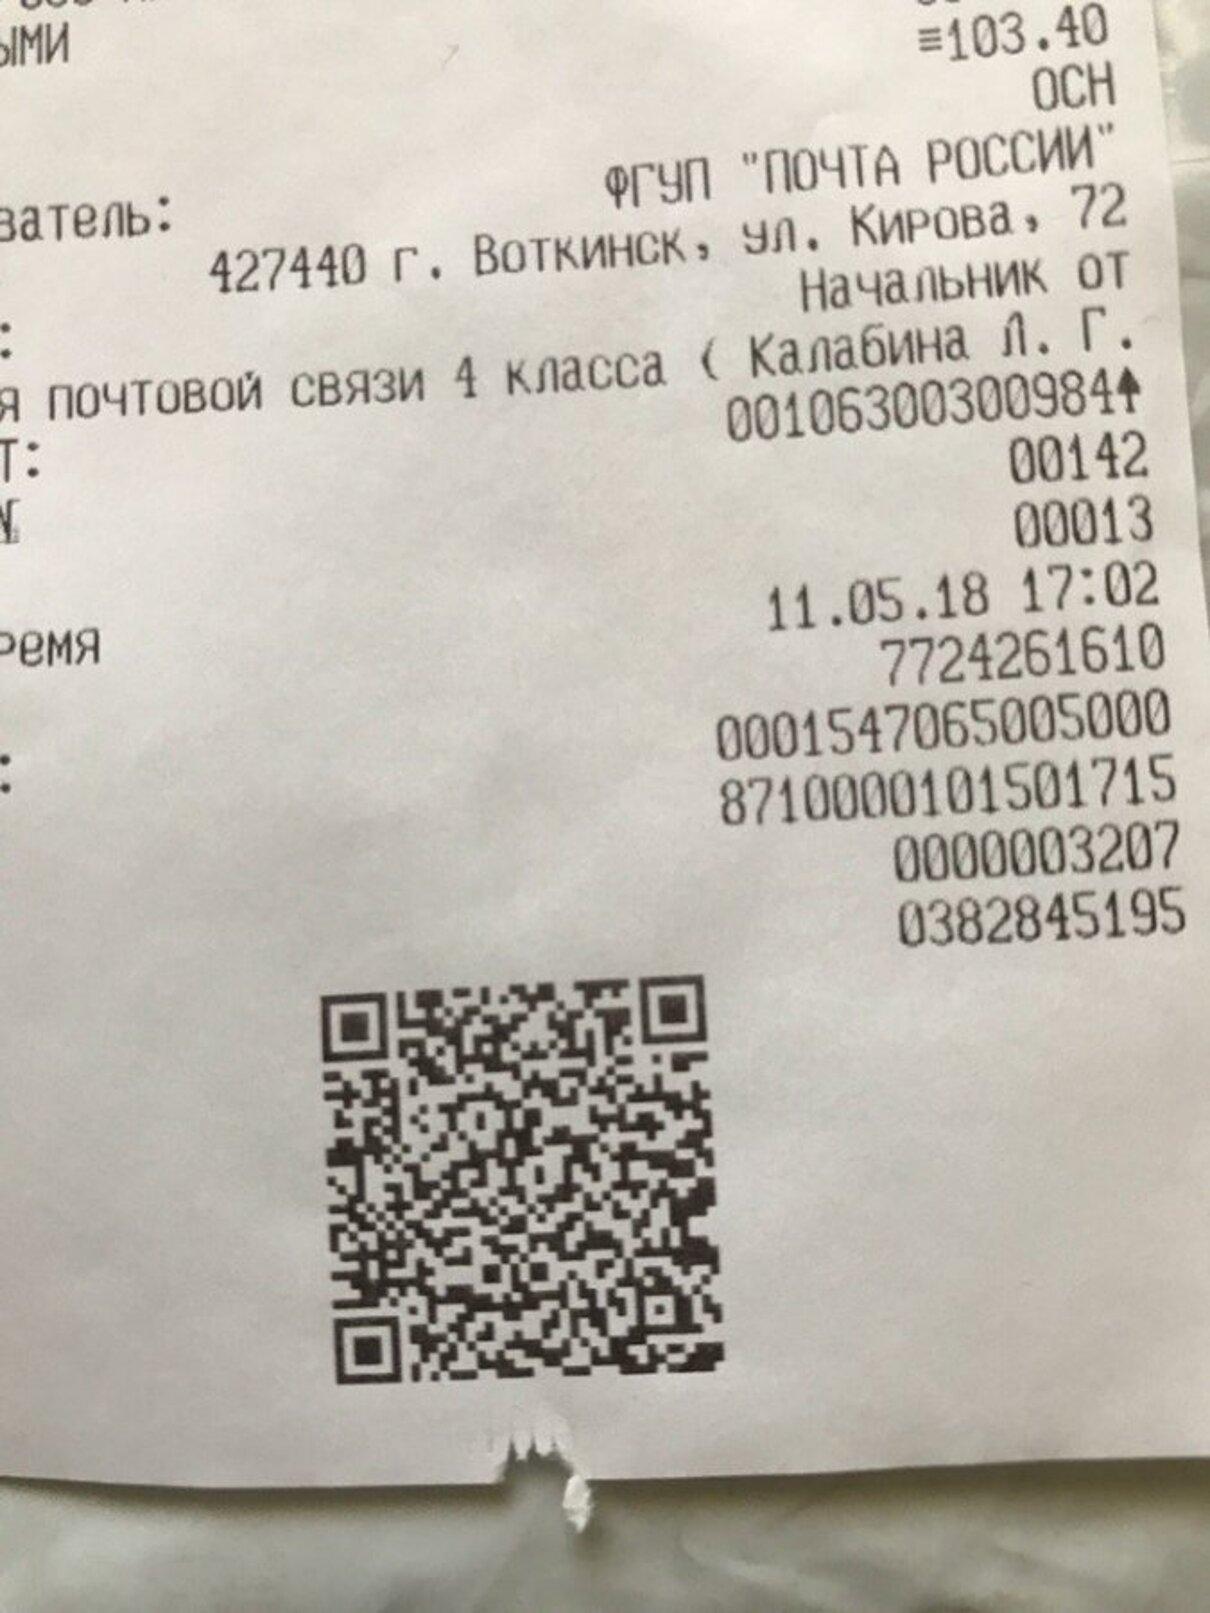 Жалоба-отзыв: Светлана - Прислали не тот товар.  Фото №2